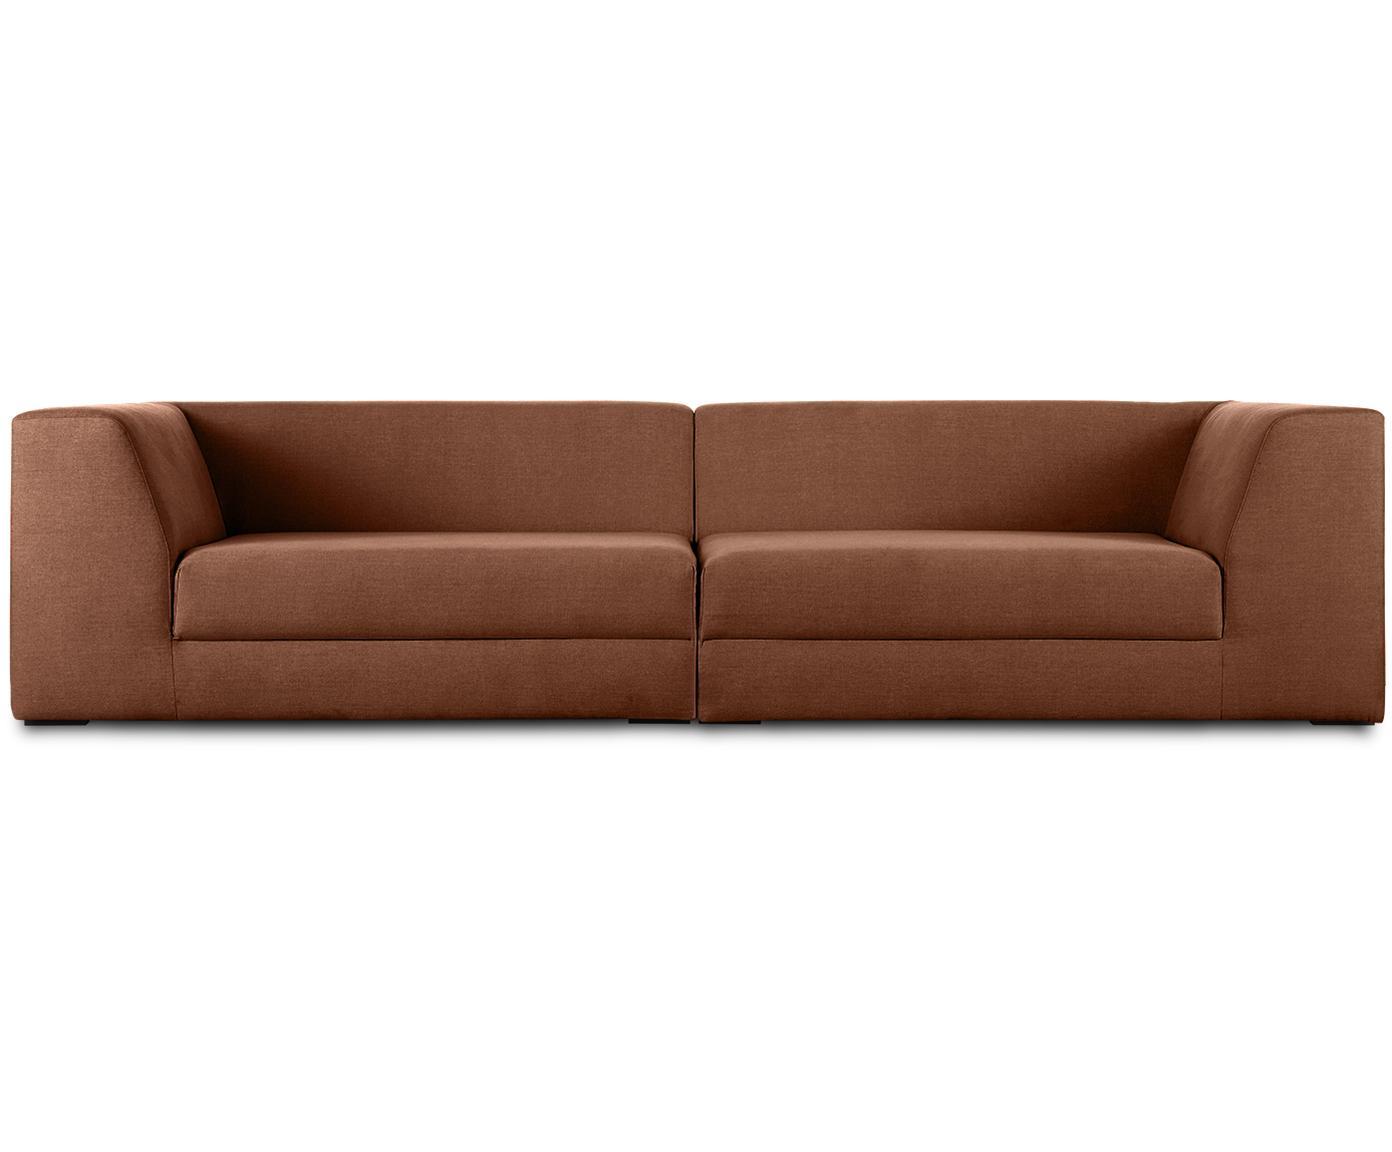 Modulares Sofa Grant (3-Sitzer), Bezug: Baumwolle 20.000 Scheuert, Gestell: Fichtenholz, Füße: Massives Buchenholz, lack, Webstoff Braun, B 266 x T 106 cm